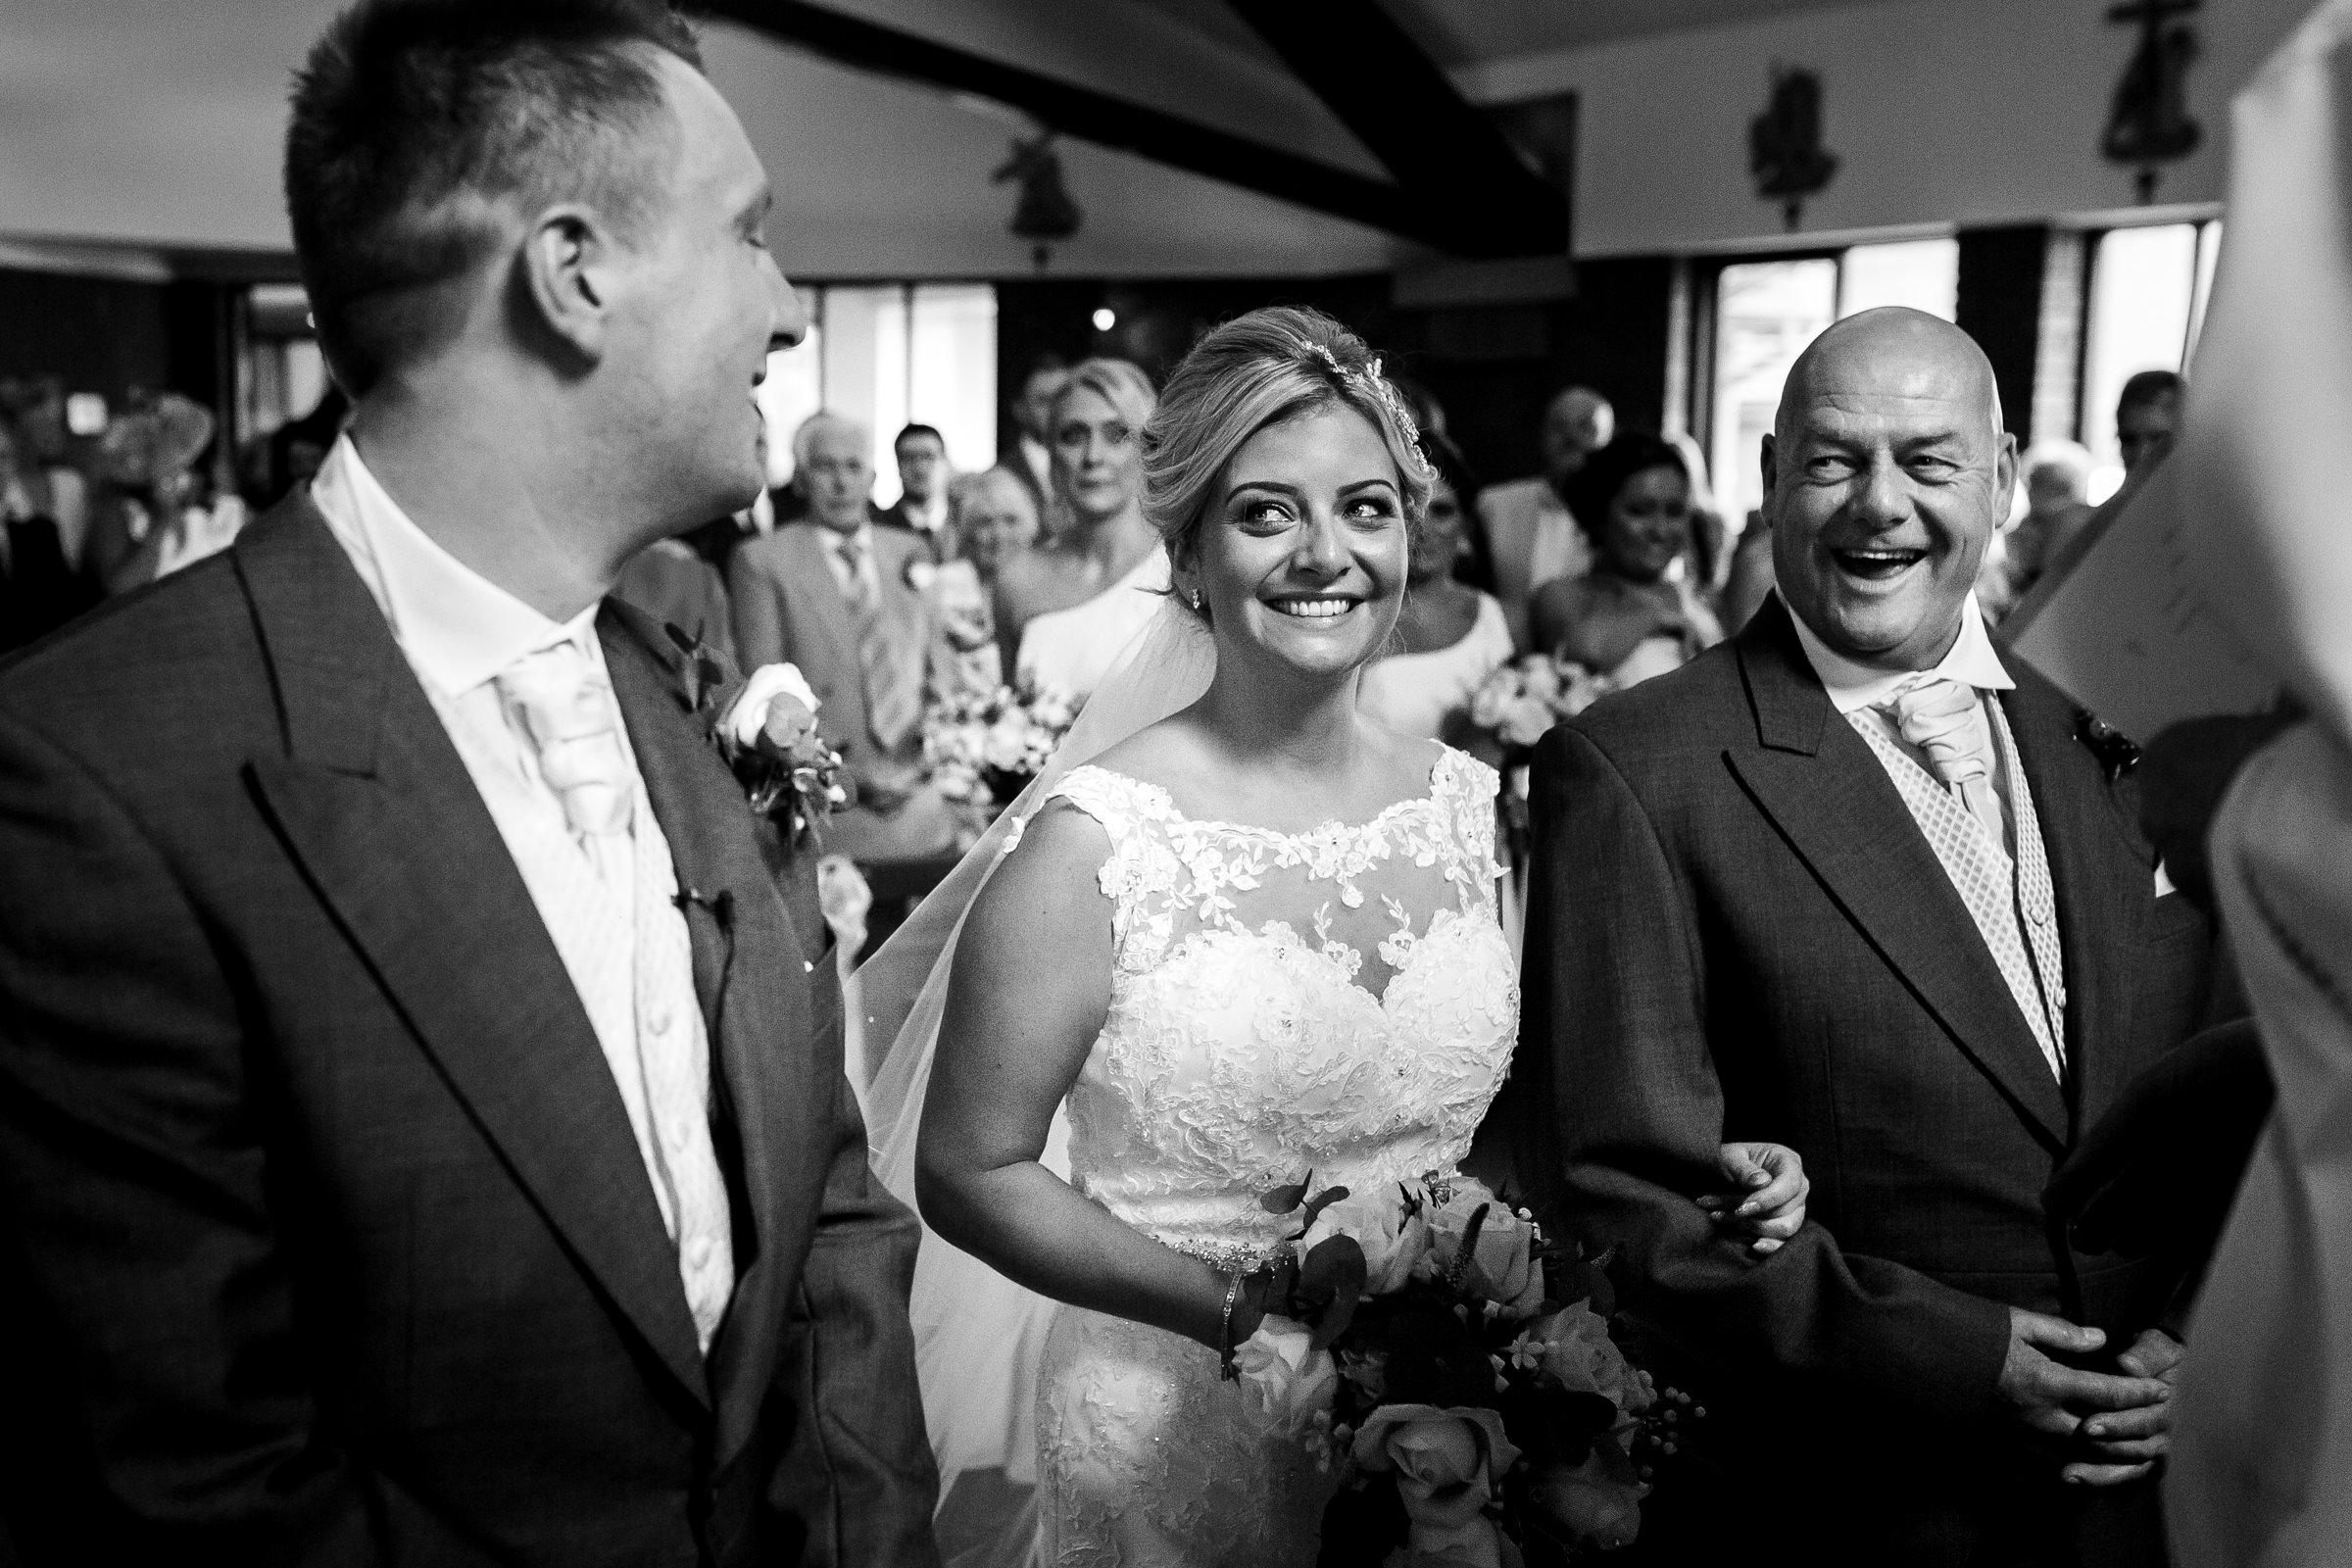 Natural wedding photo of bride walking down the aisle